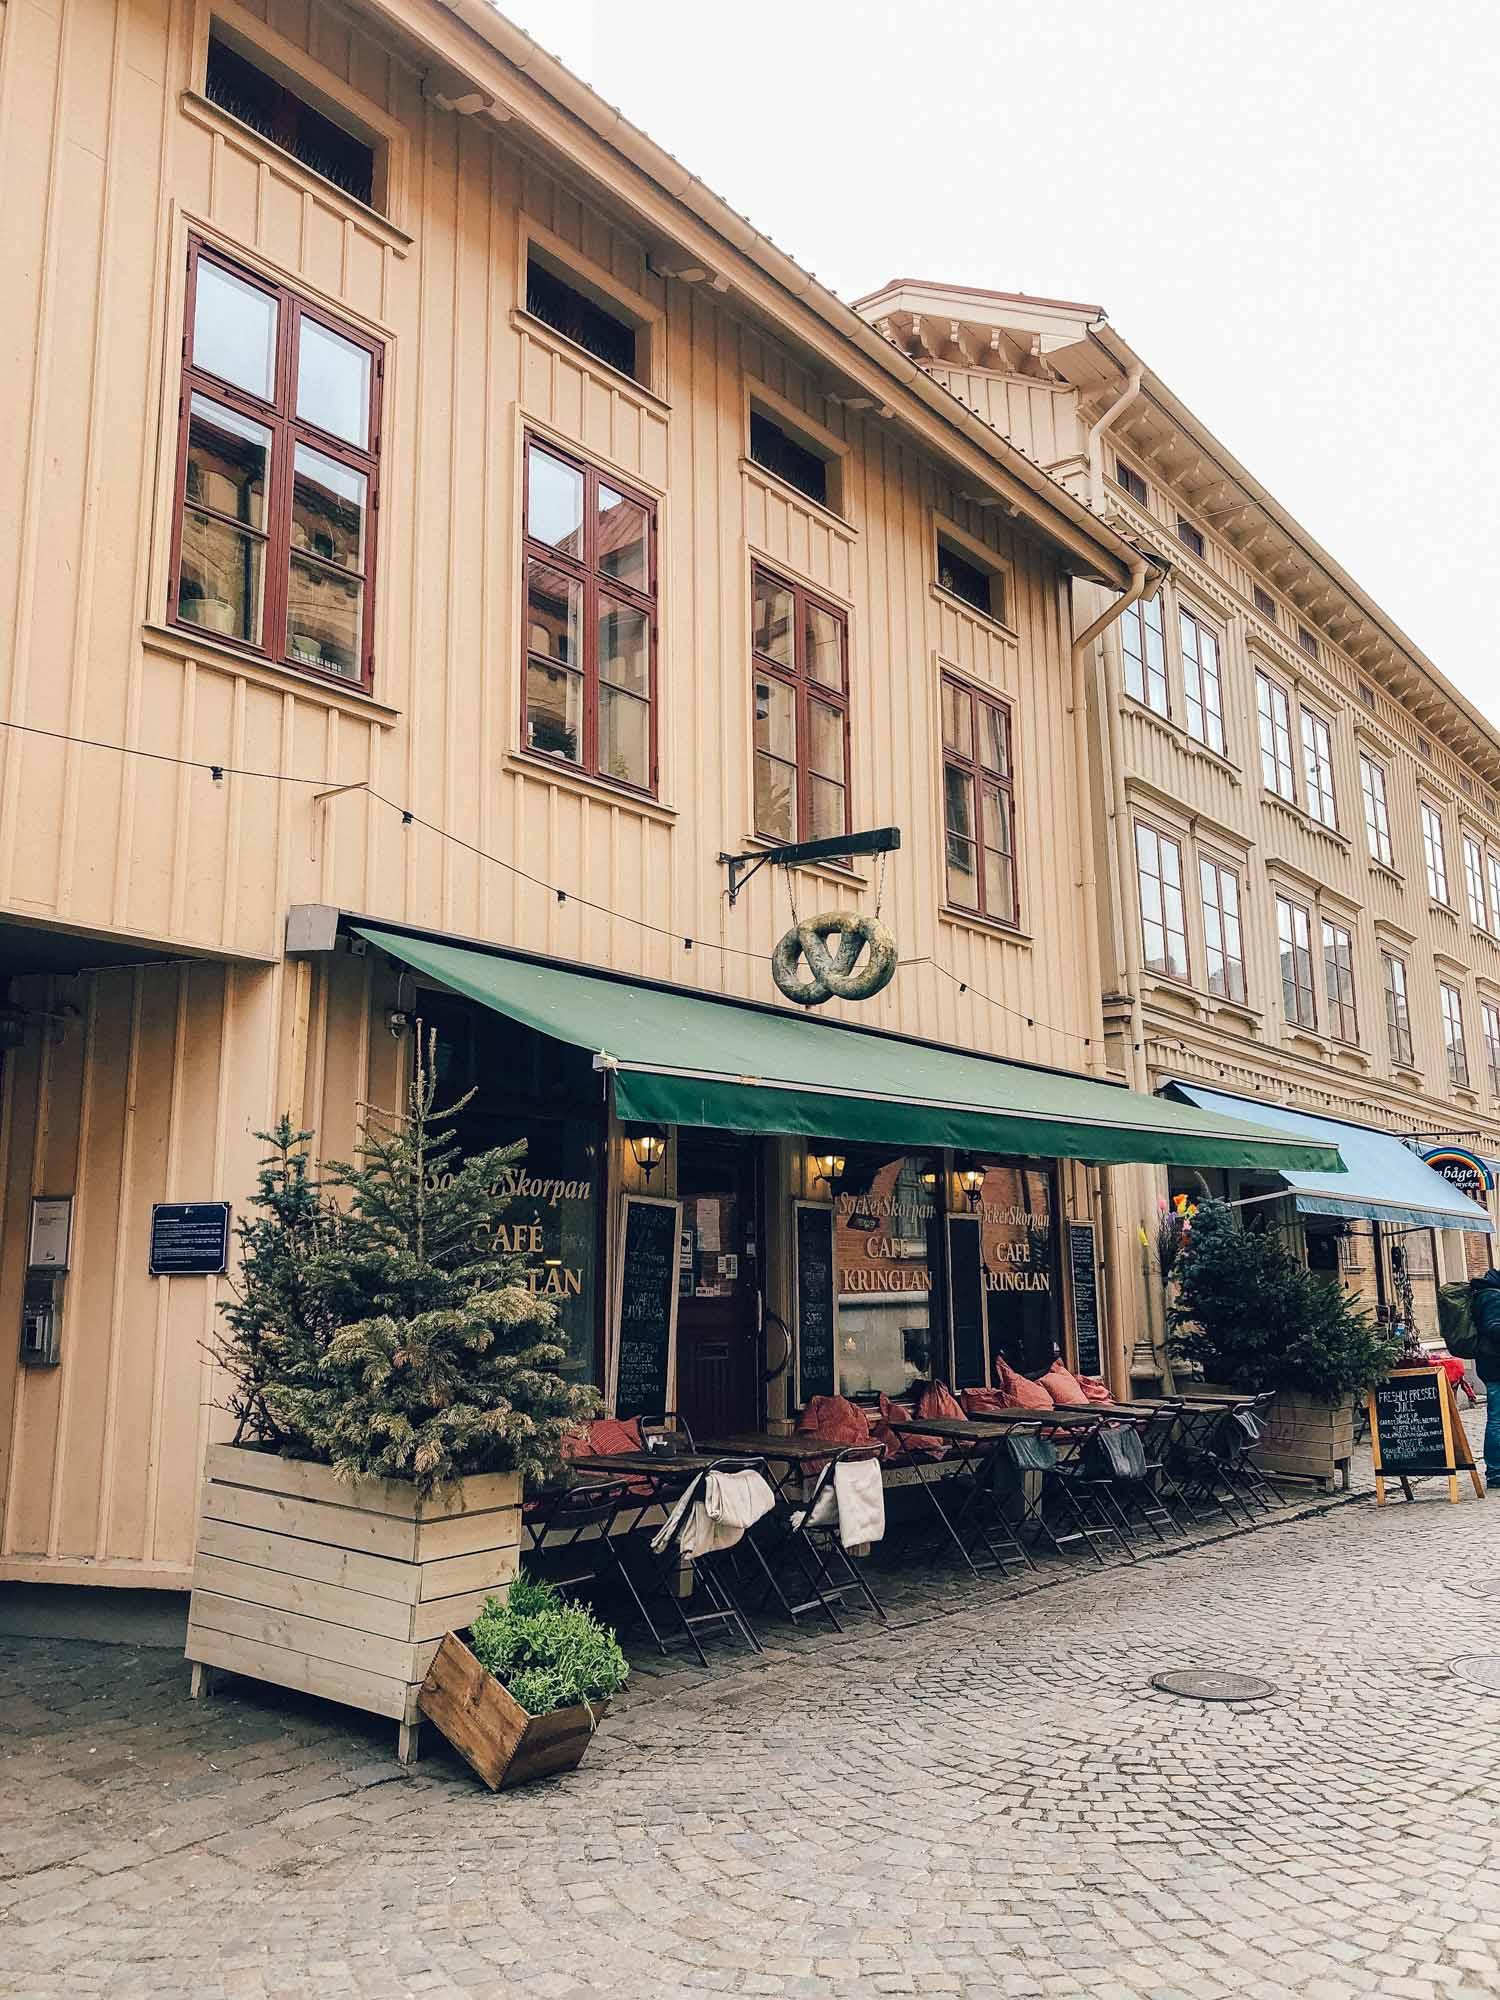 CafeKringlan